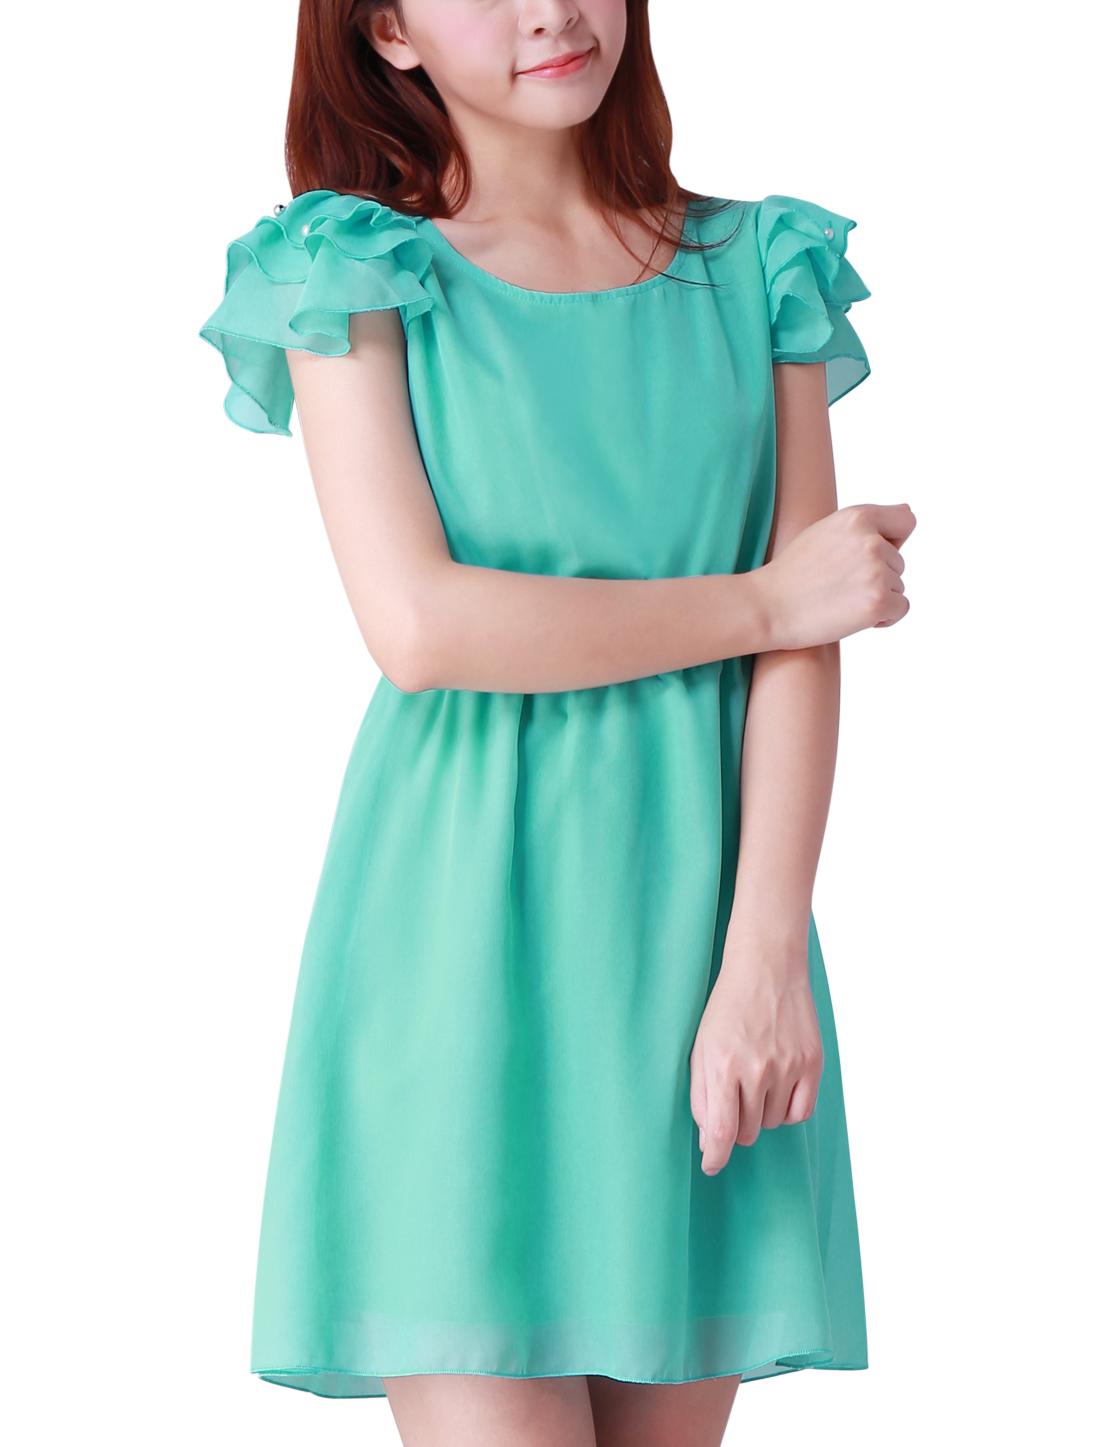 Beads Decor Short Sleeve Light Blue Mini Dress for Lady XL